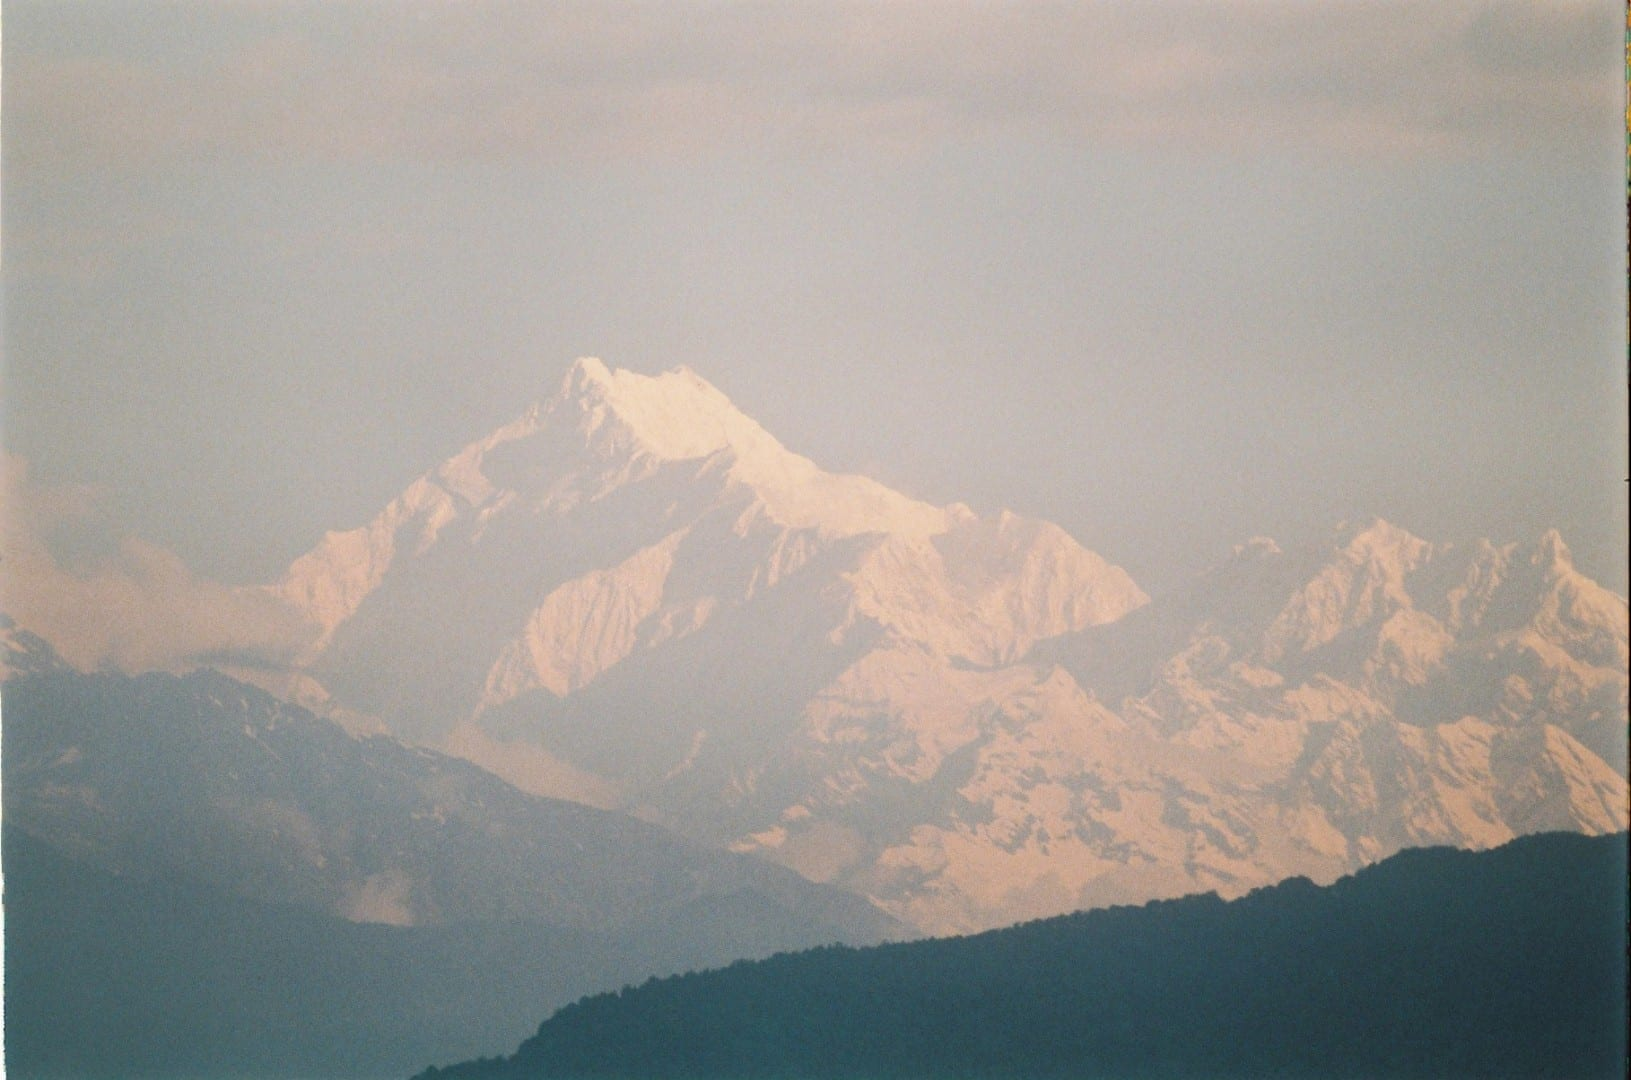 Kanchenjunga visto desde el punto de vista de Tashi Gangtok India